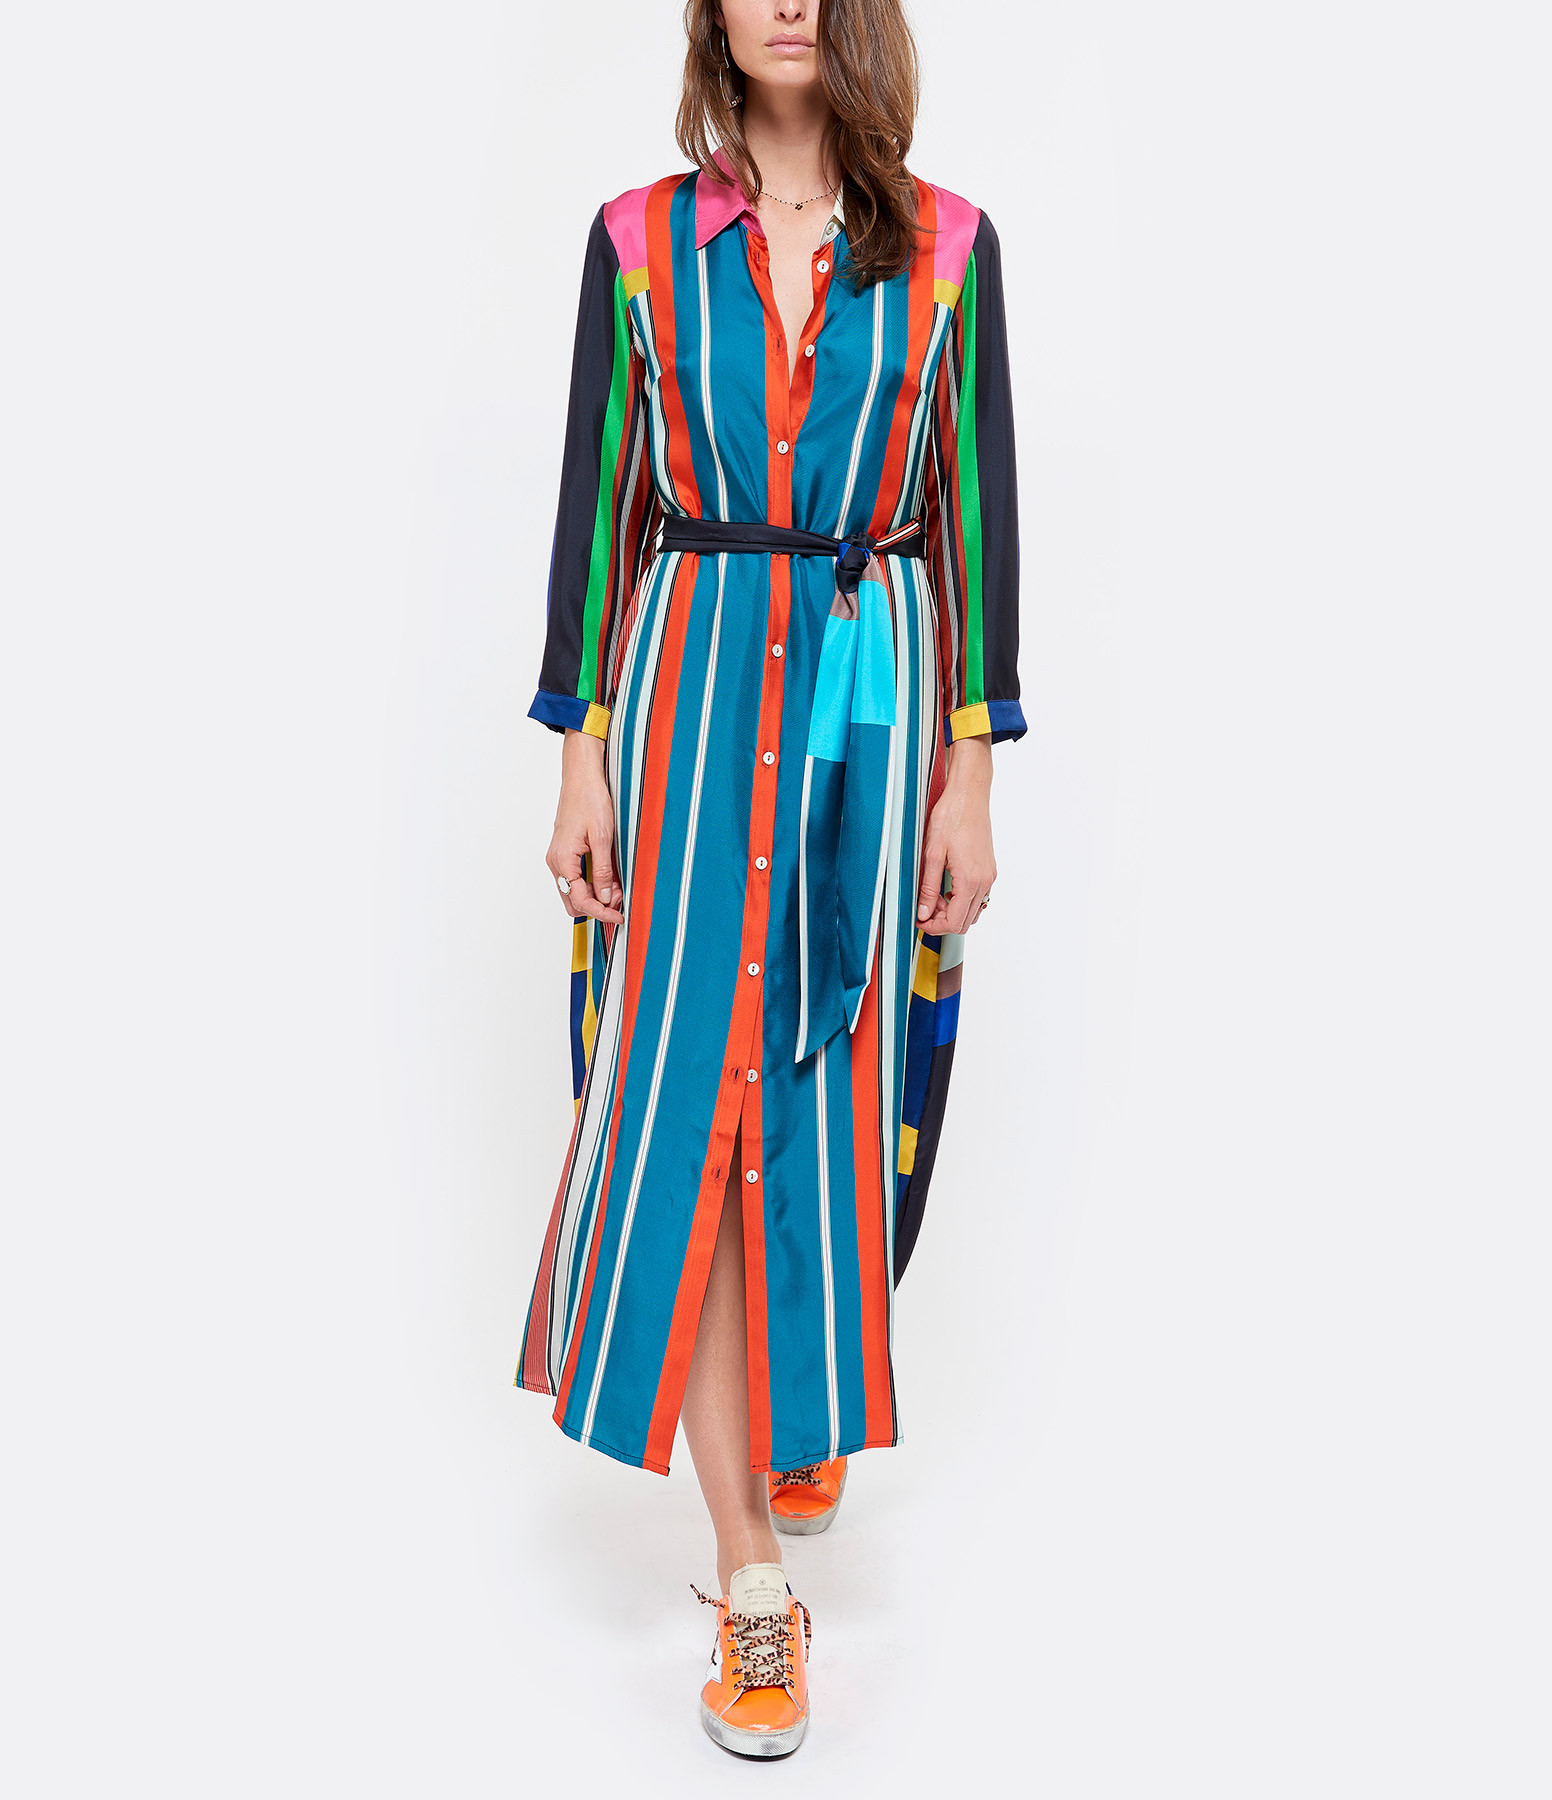 PIERRE-LOUIS MASCIA - Robe Aloe Soie Rayures Multicolore